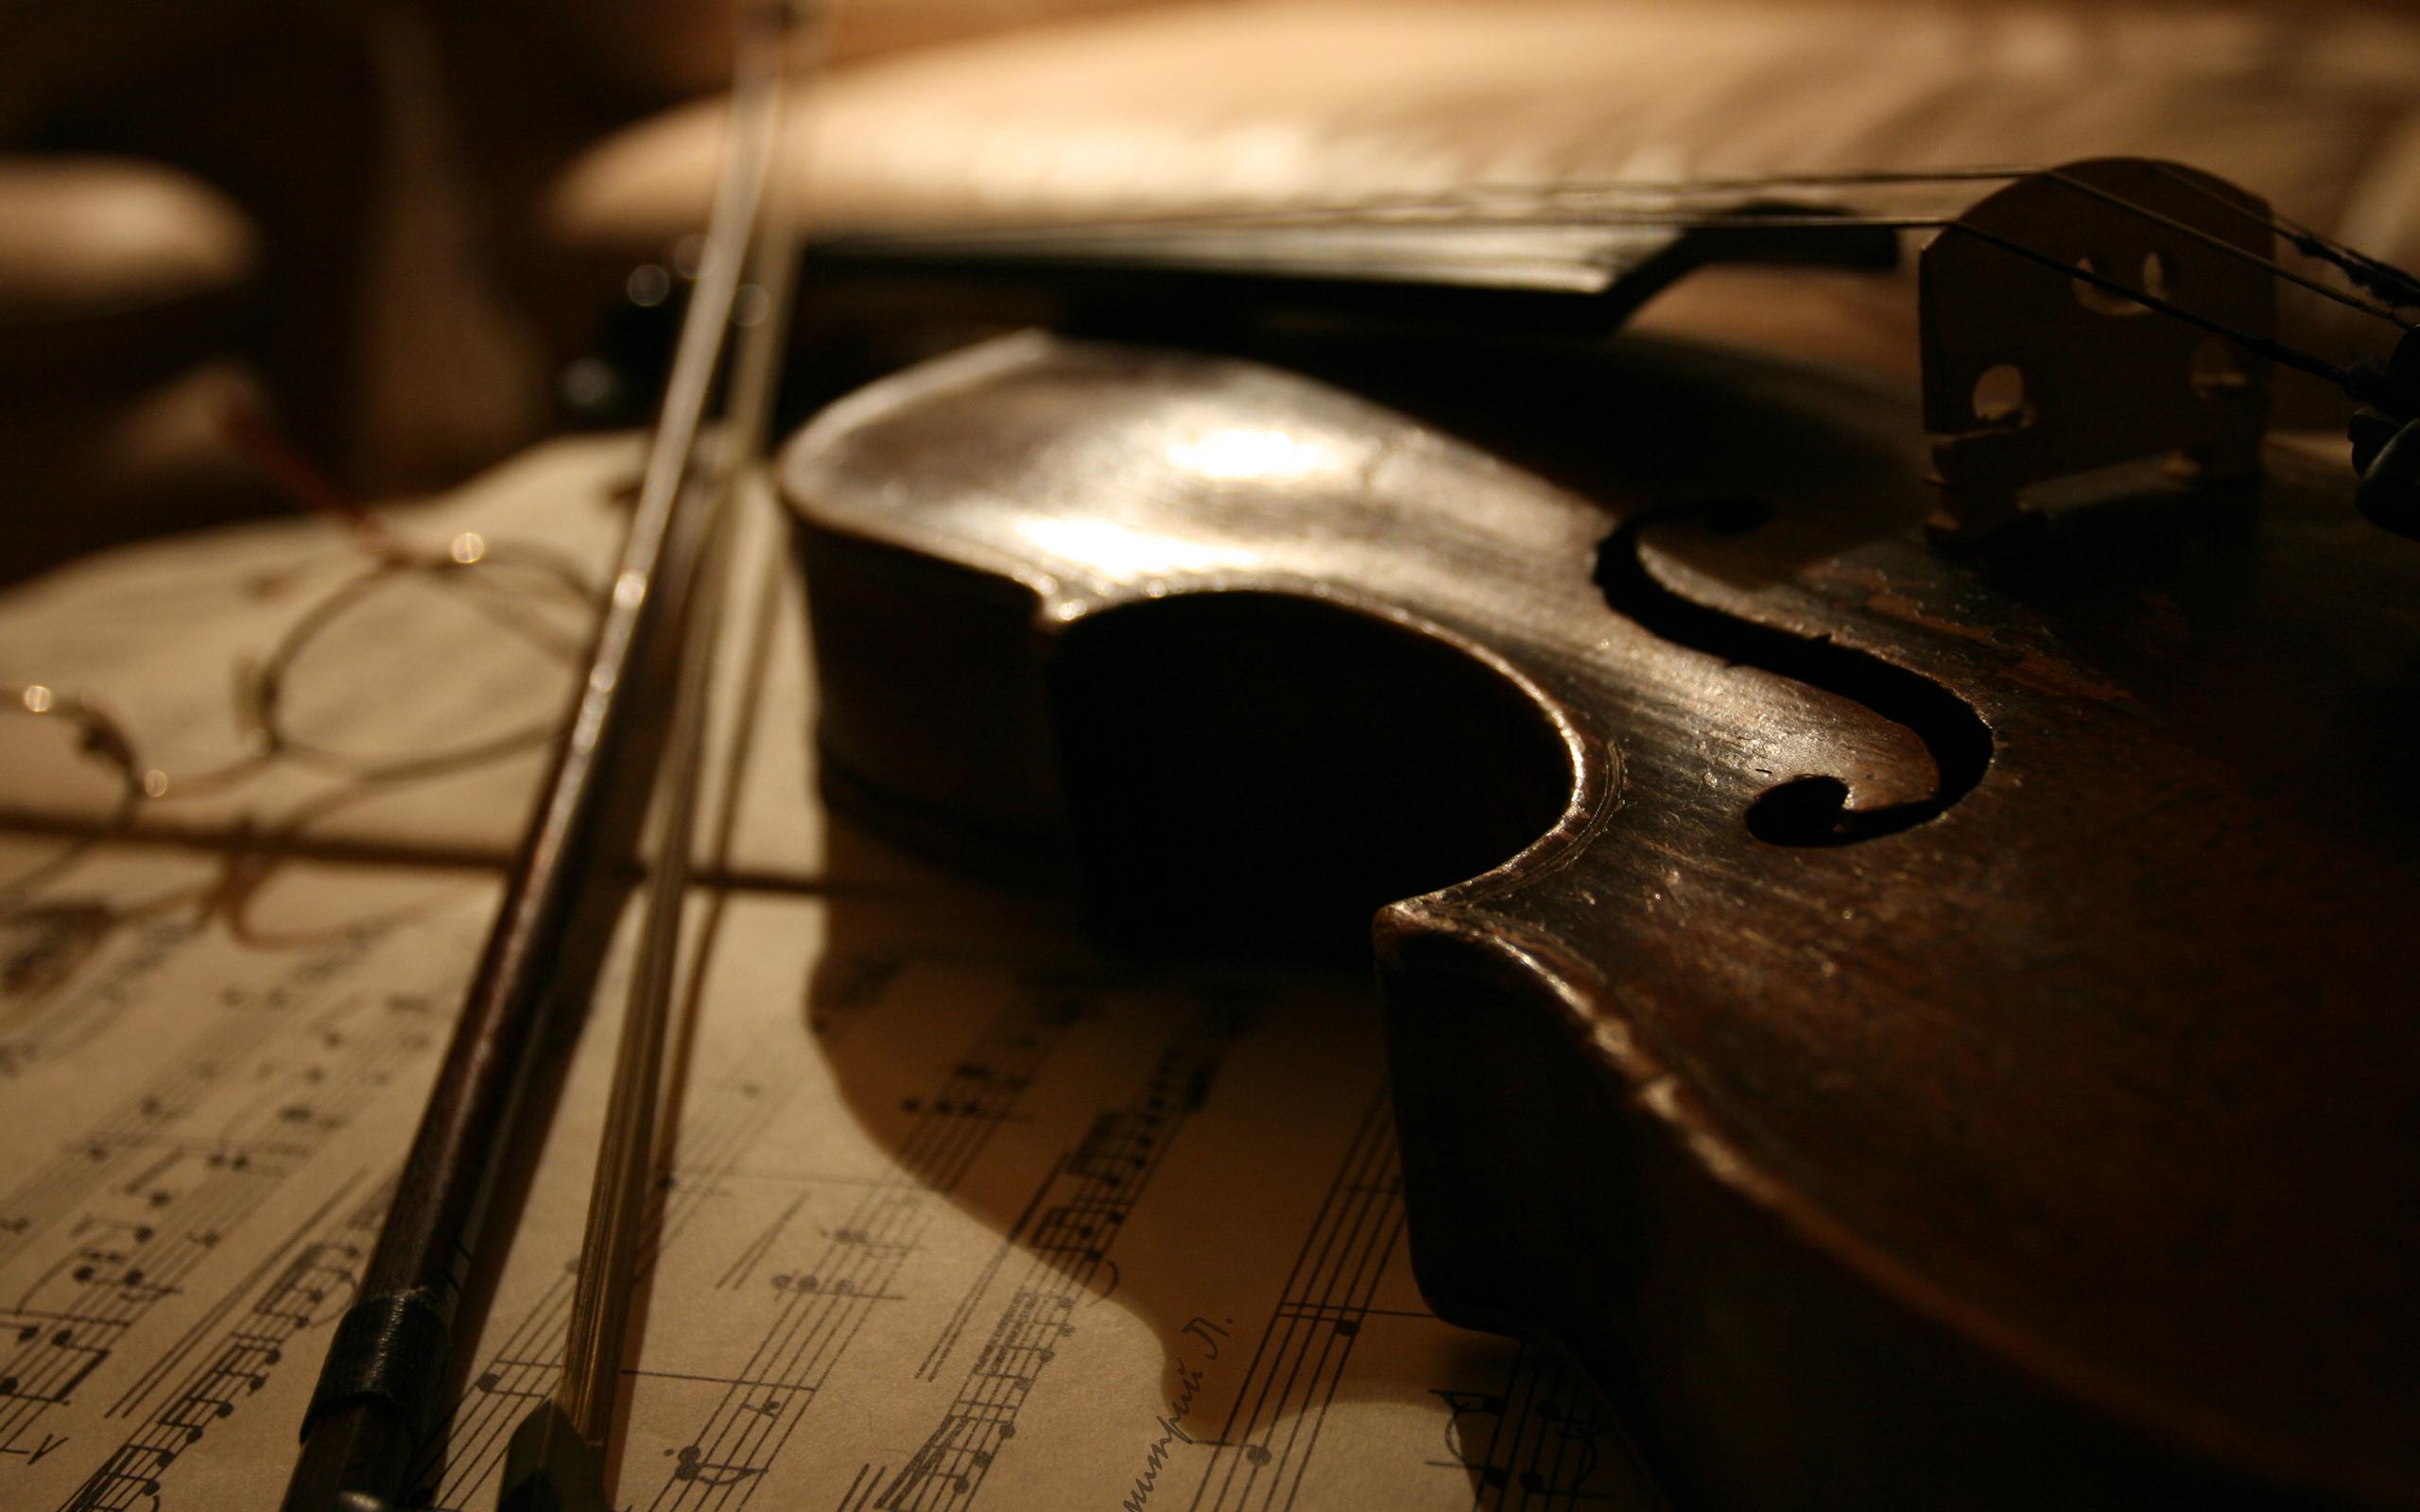 violin wallpaper background hd 387